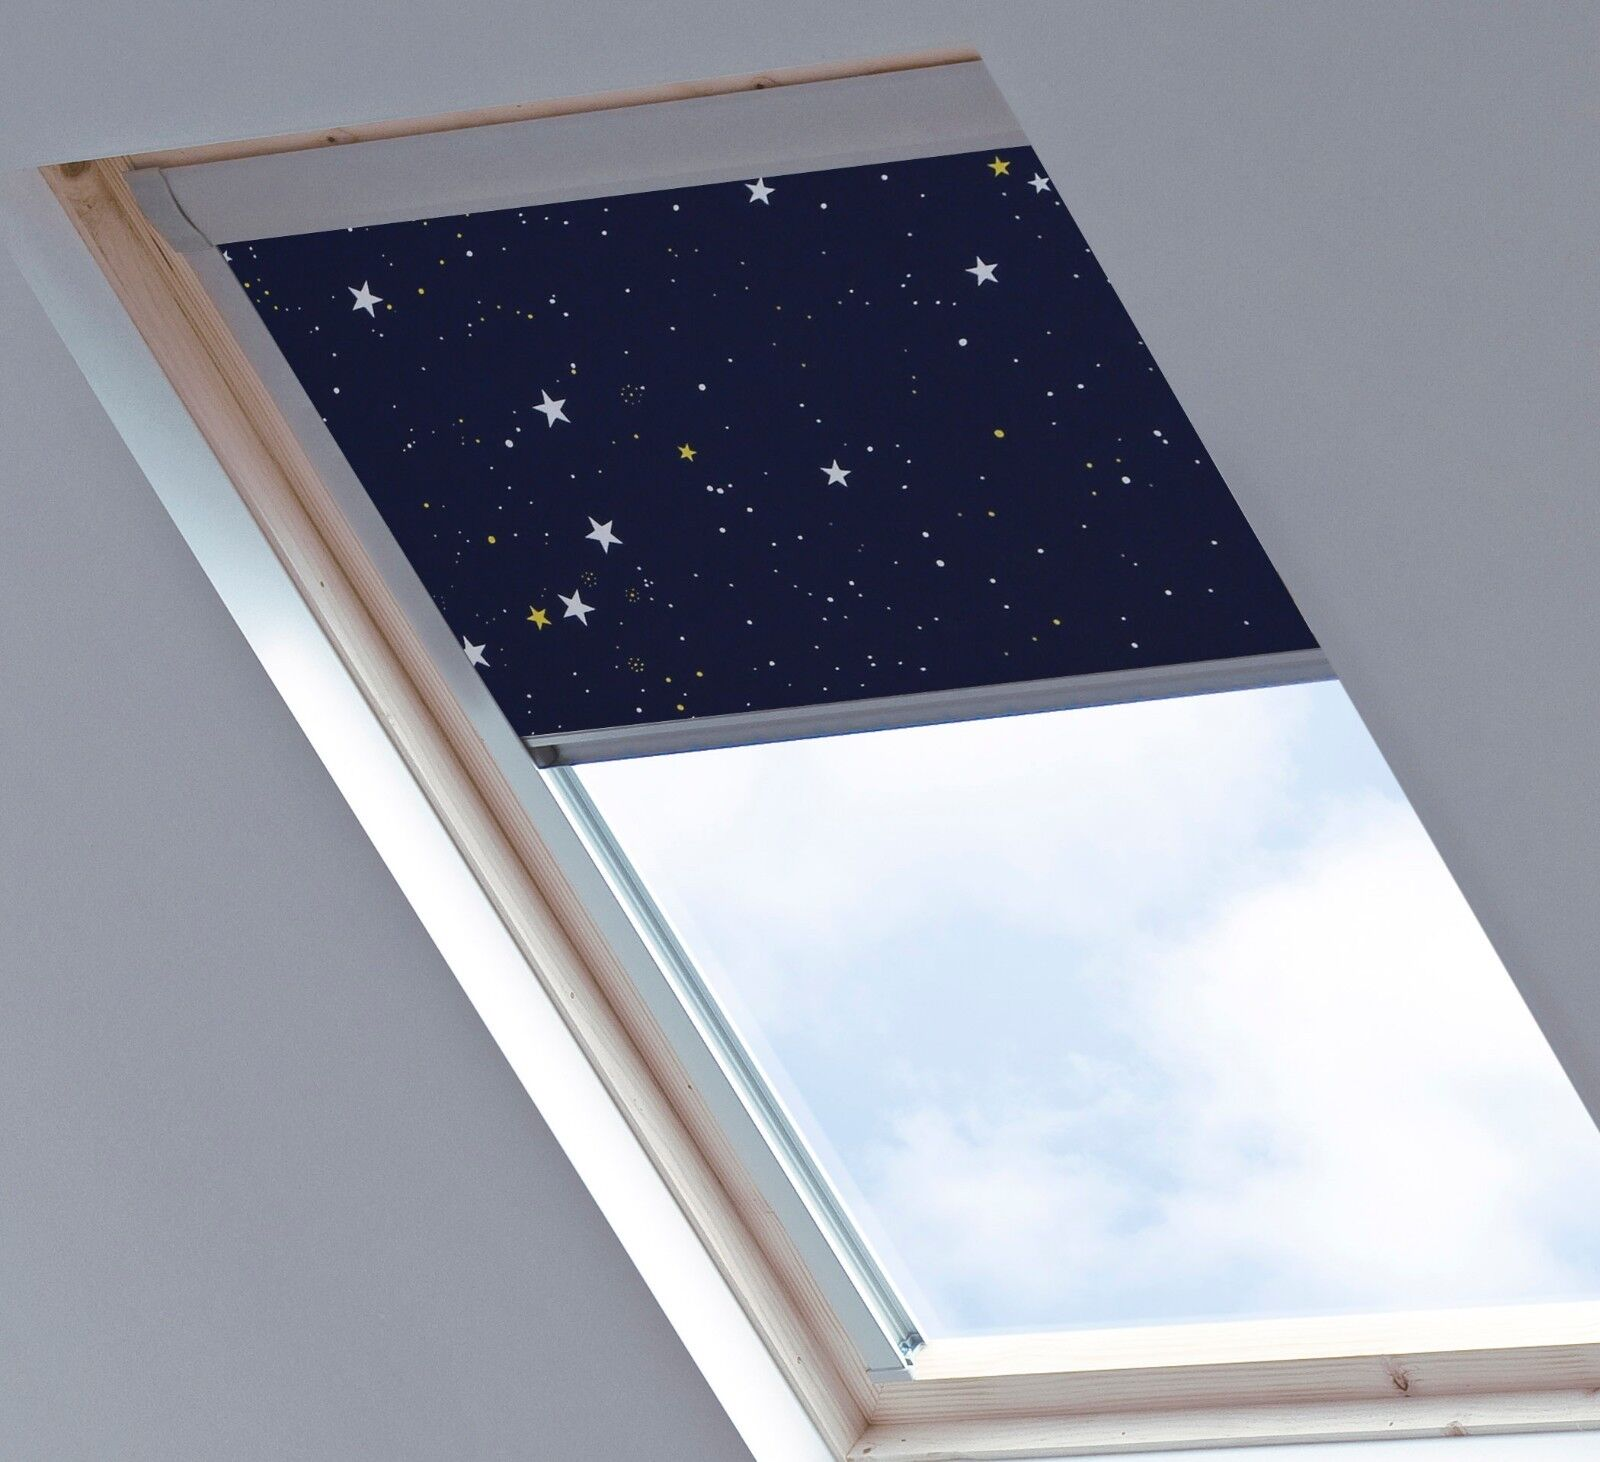 Estrellas En Azul Marino negroout Skylight Persianas-tamaños para Velux, fakro, rooflite   dakstra